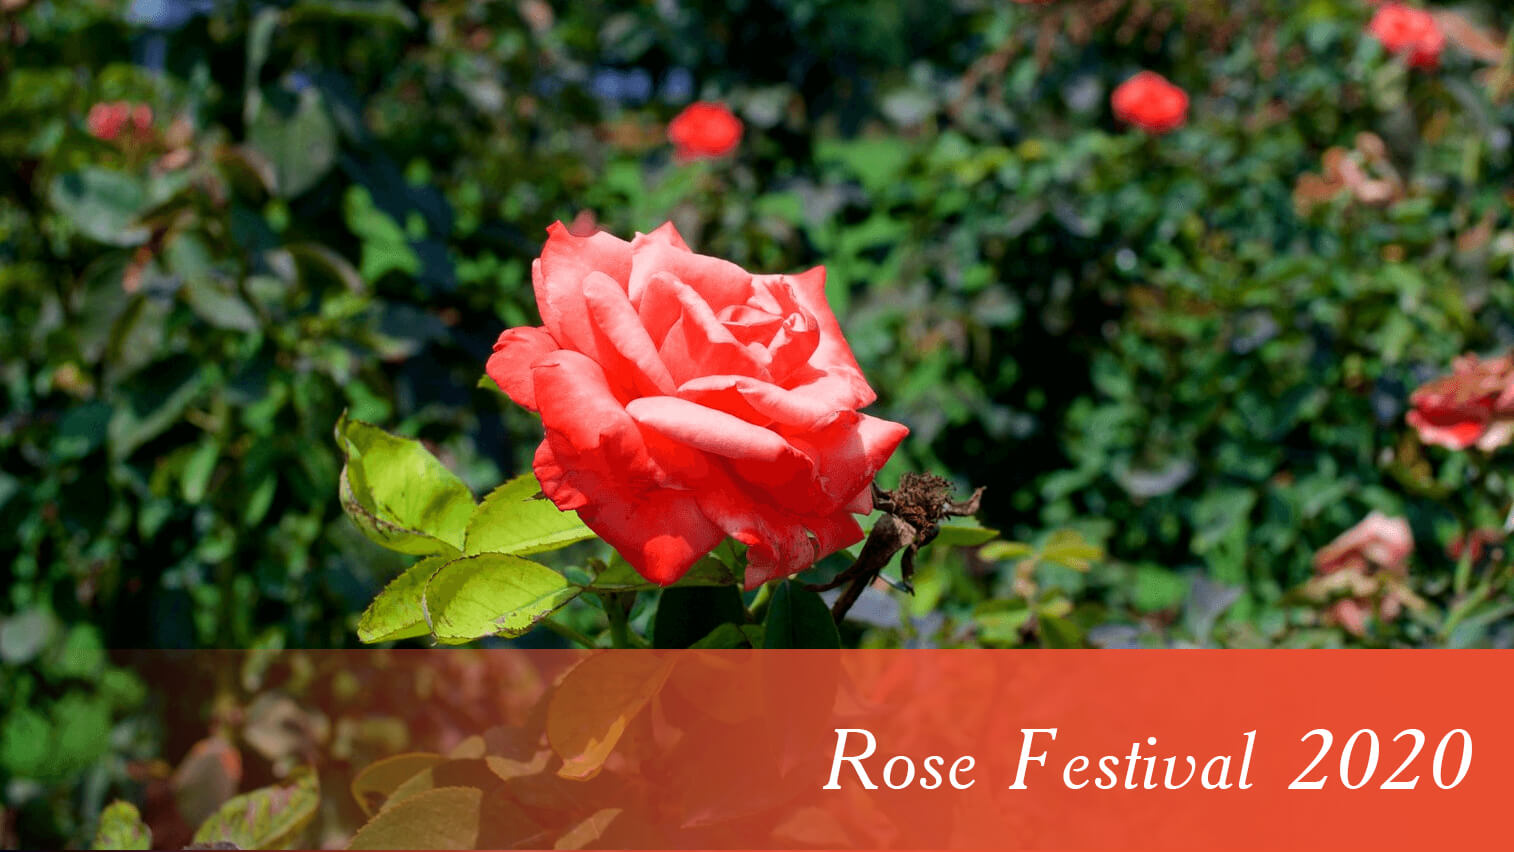 Rose Festival Chandigarh 2020